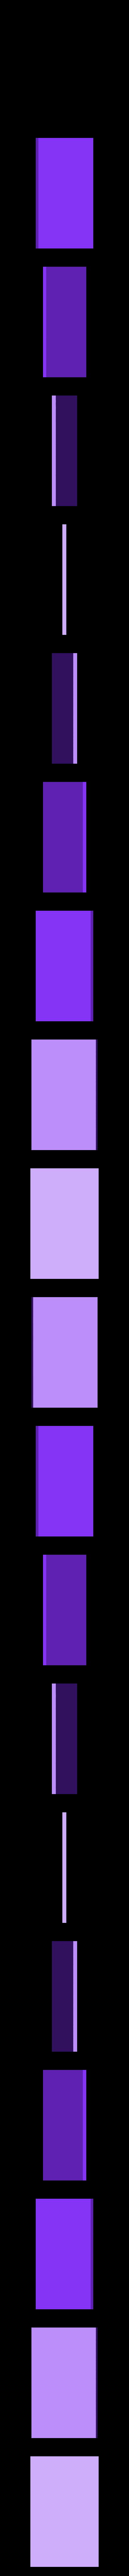 BlockInsert.stl Download STL file Playing Card Tiles • Object to 3D print, Jinja